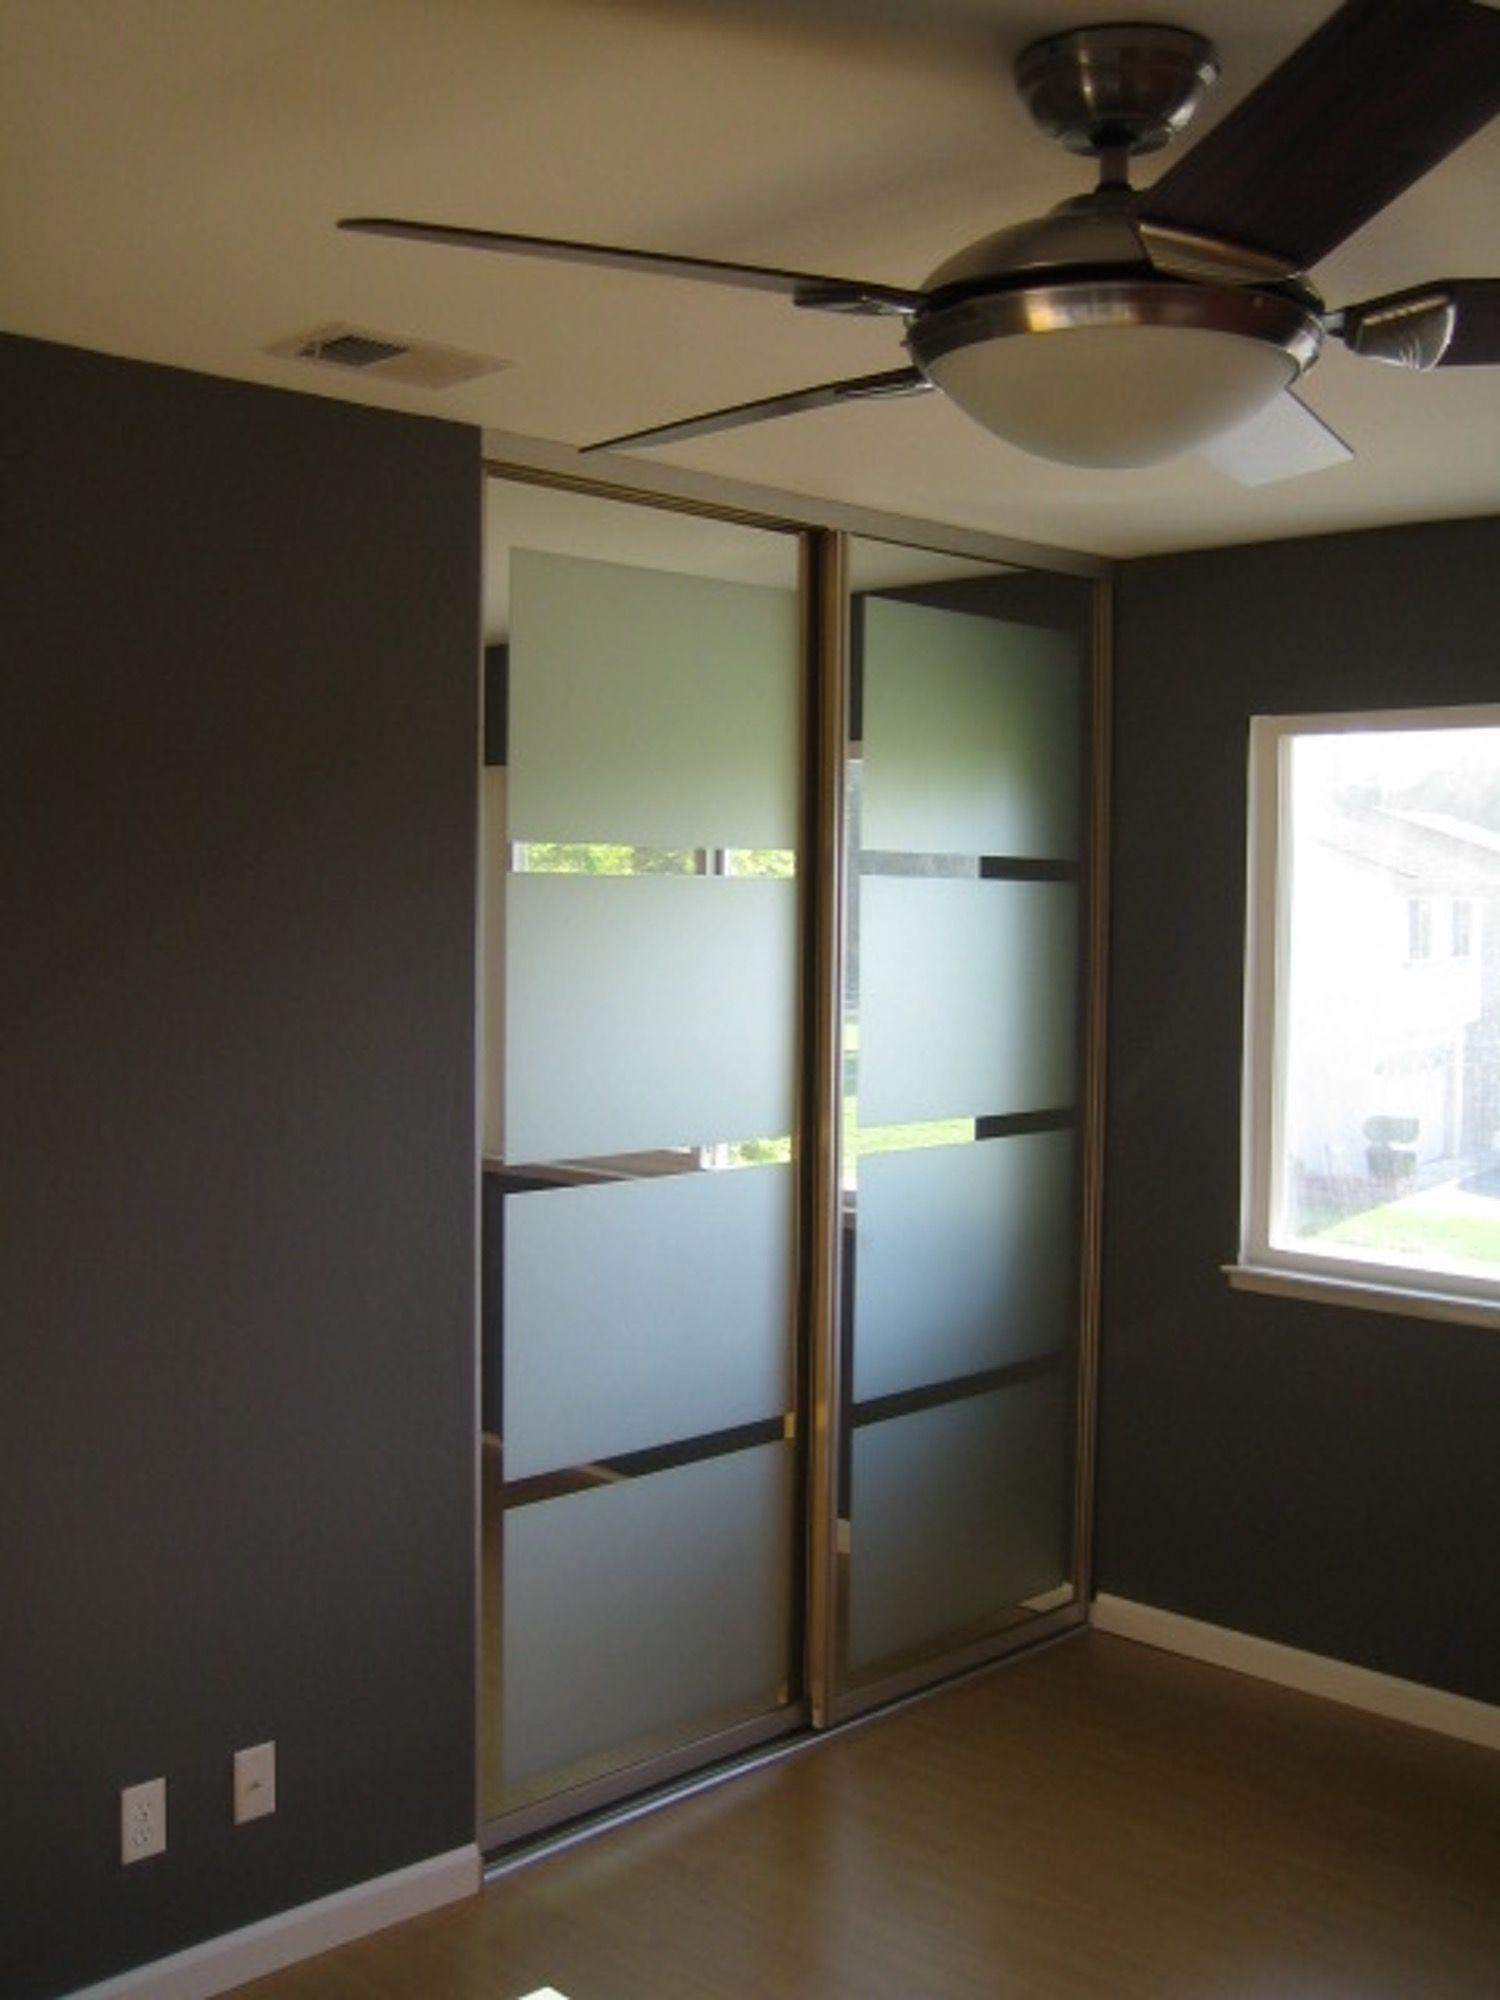 Mirrored Closet Doors: The $25 Makeover!   Mirrored closet doors ...